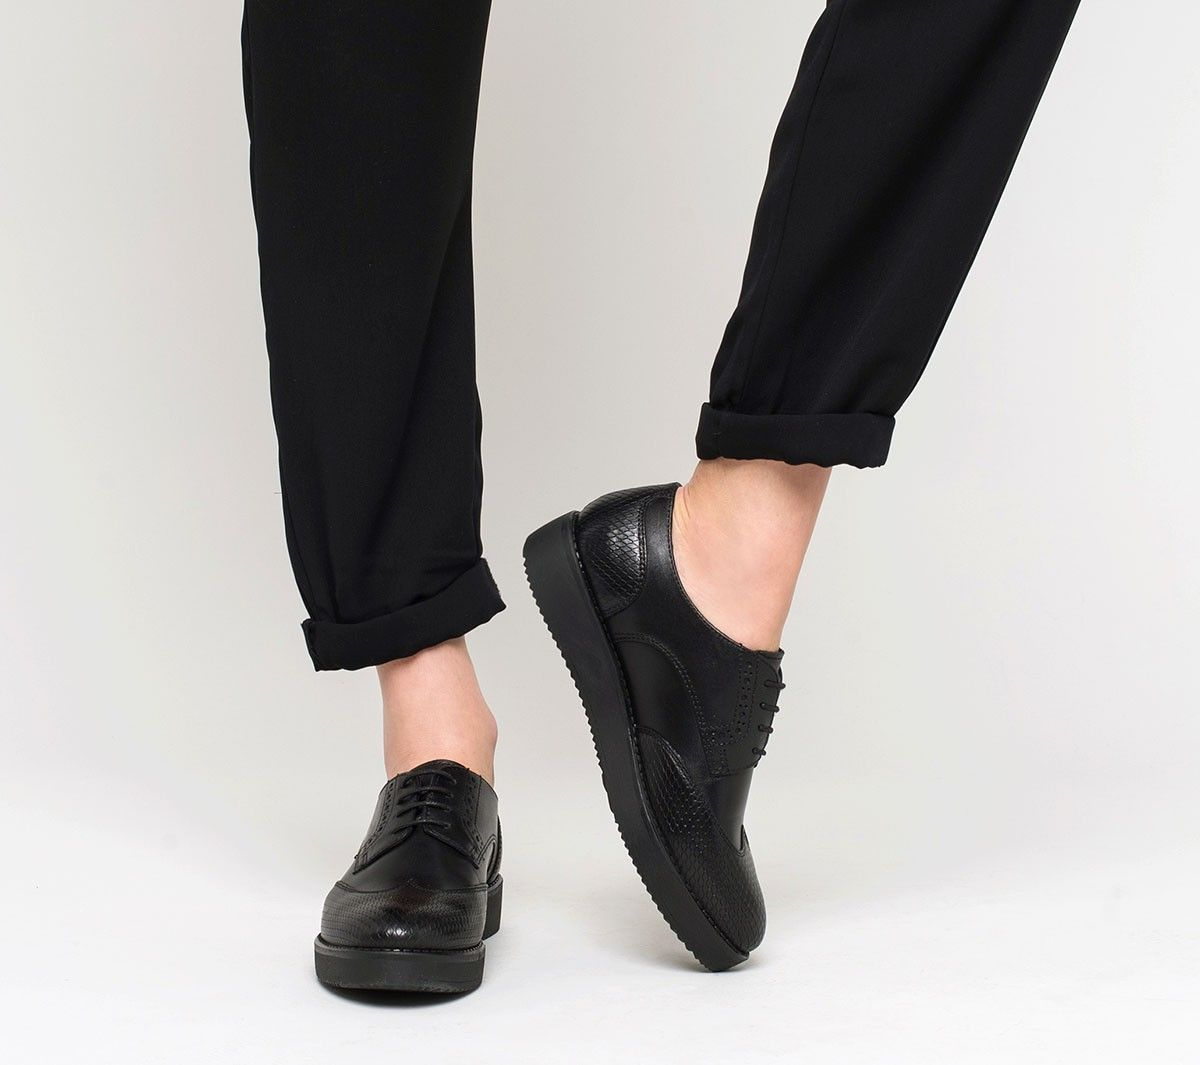 derby semelle compens e cuir noir derbies chaussures femme chaussures pinterest derby. Black Bedroom Furniture Sets. Home Design Ideas